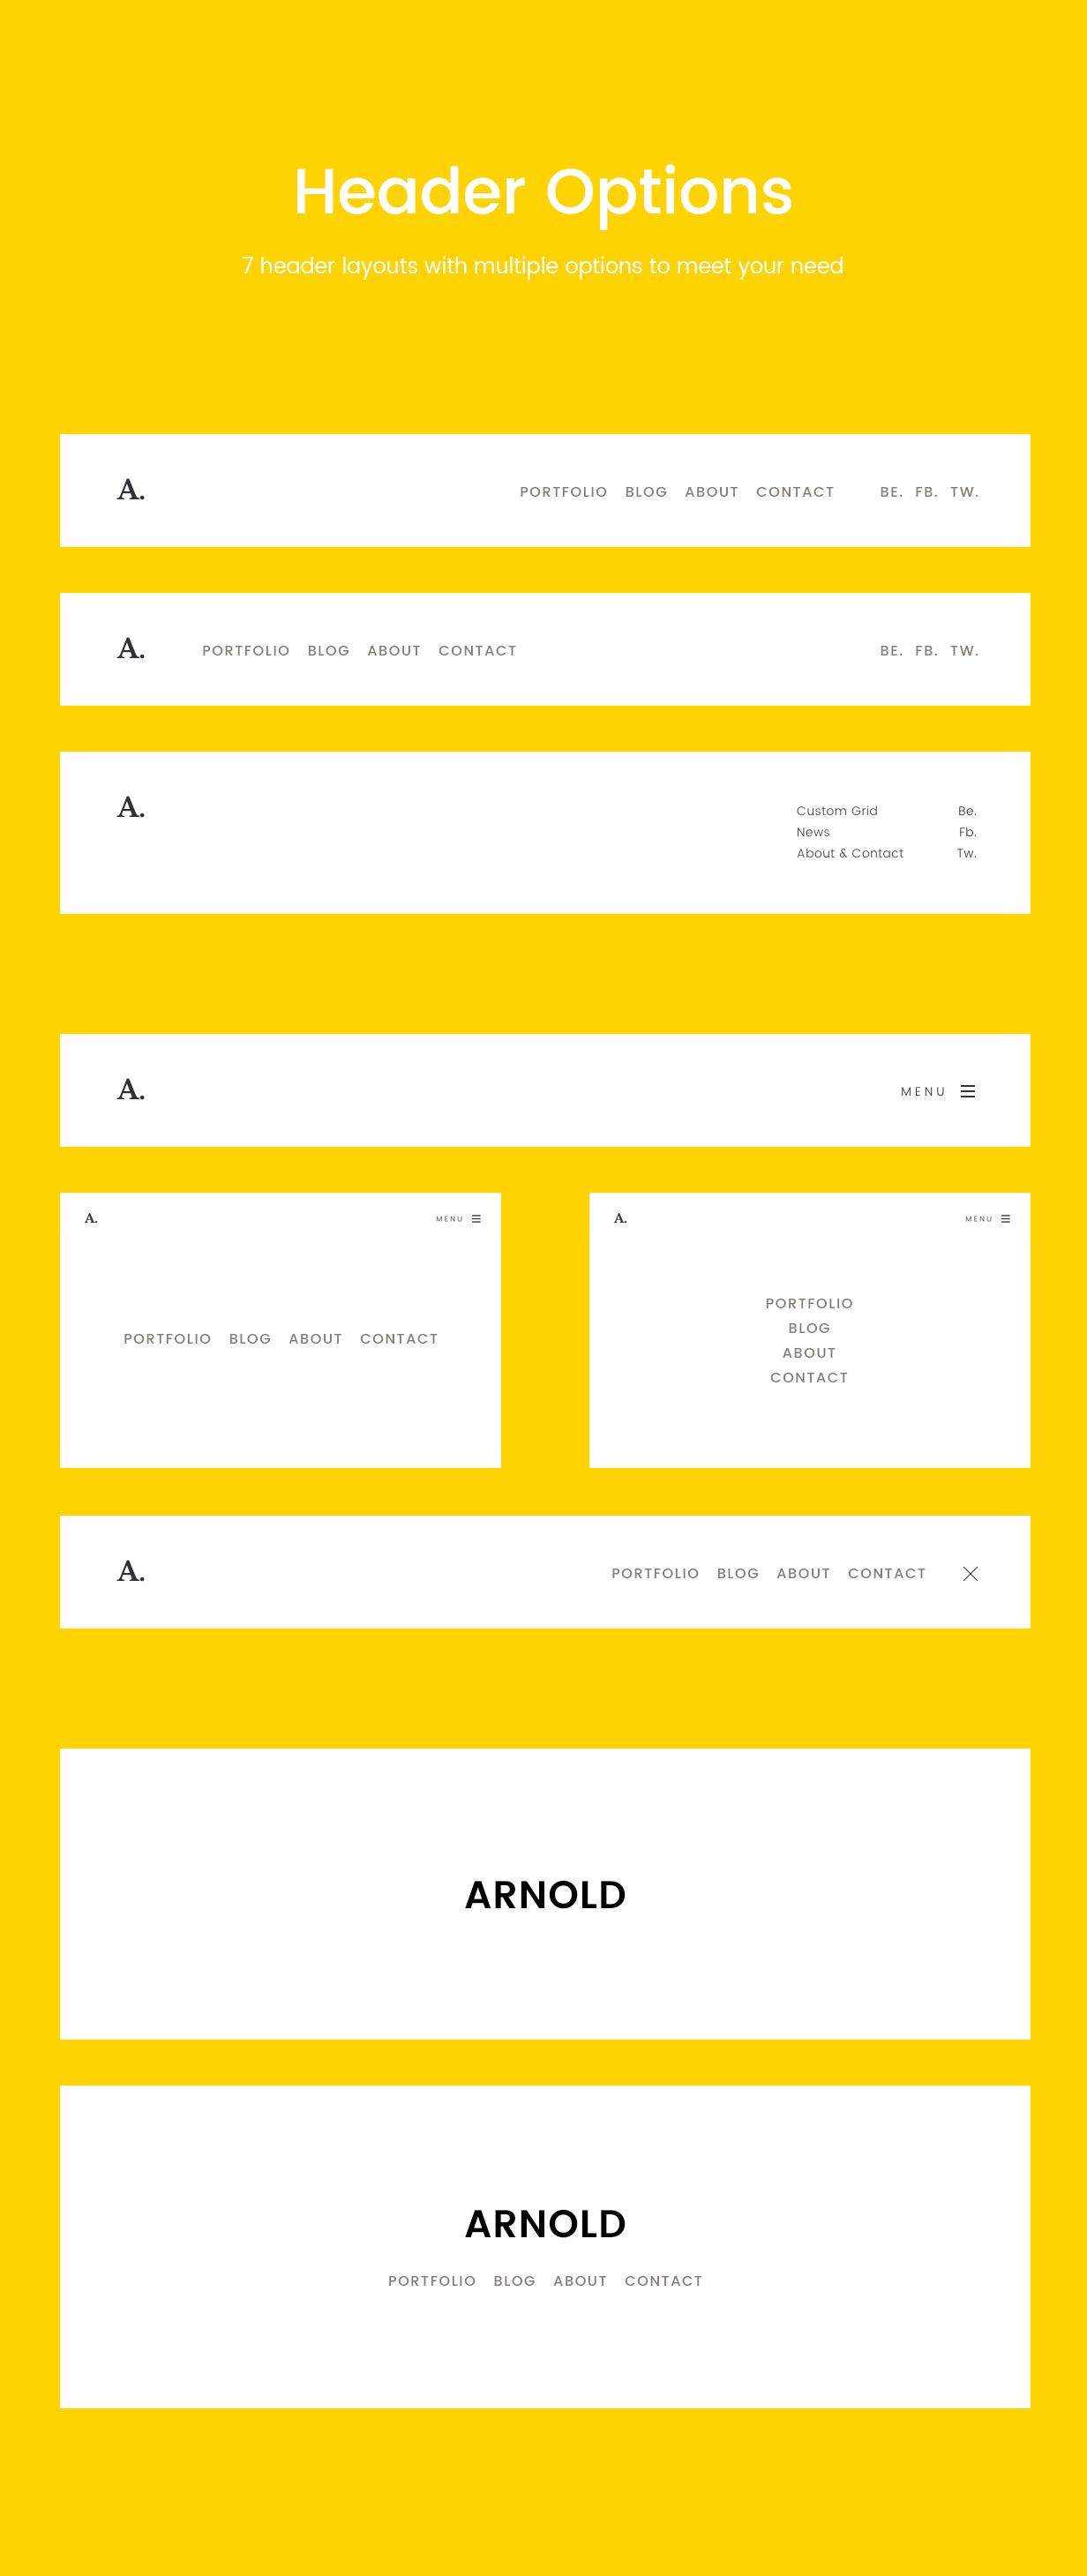 Arnold_WordPress_Theme_8_Header_layouts